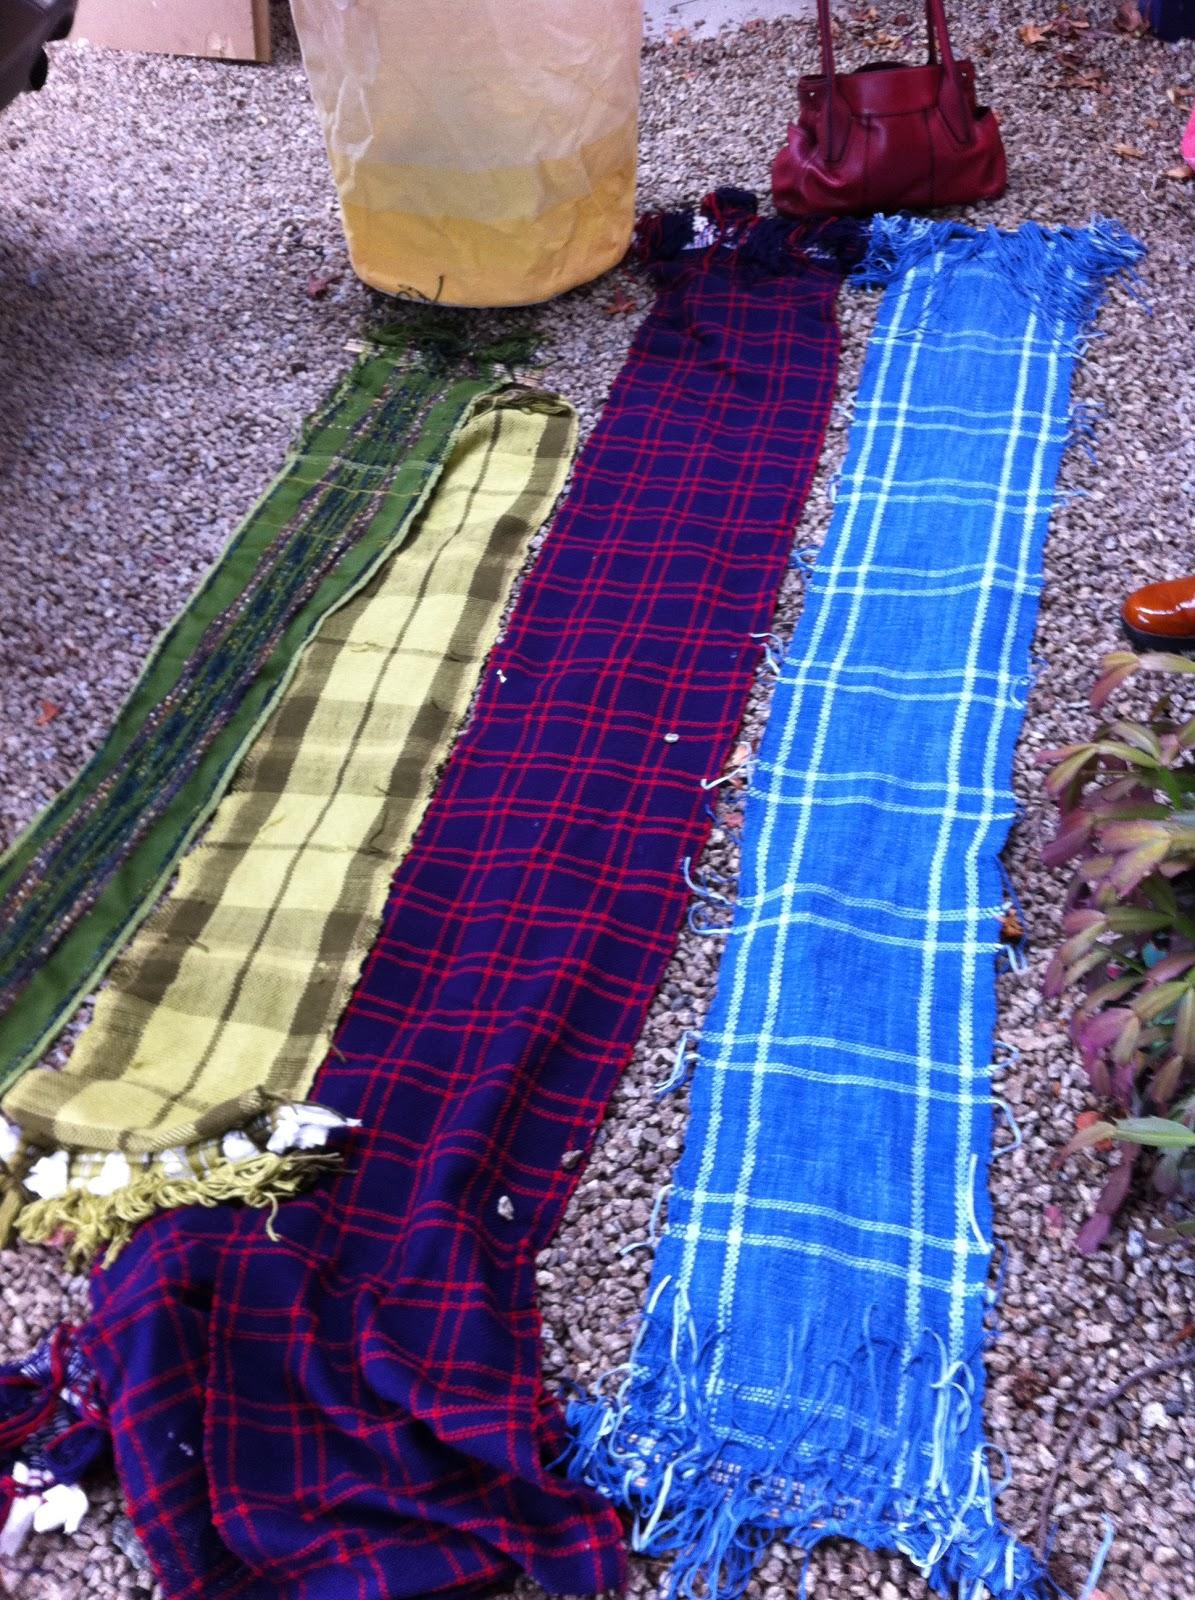 Centering With Fiber Saori Weaving Class With Rigid